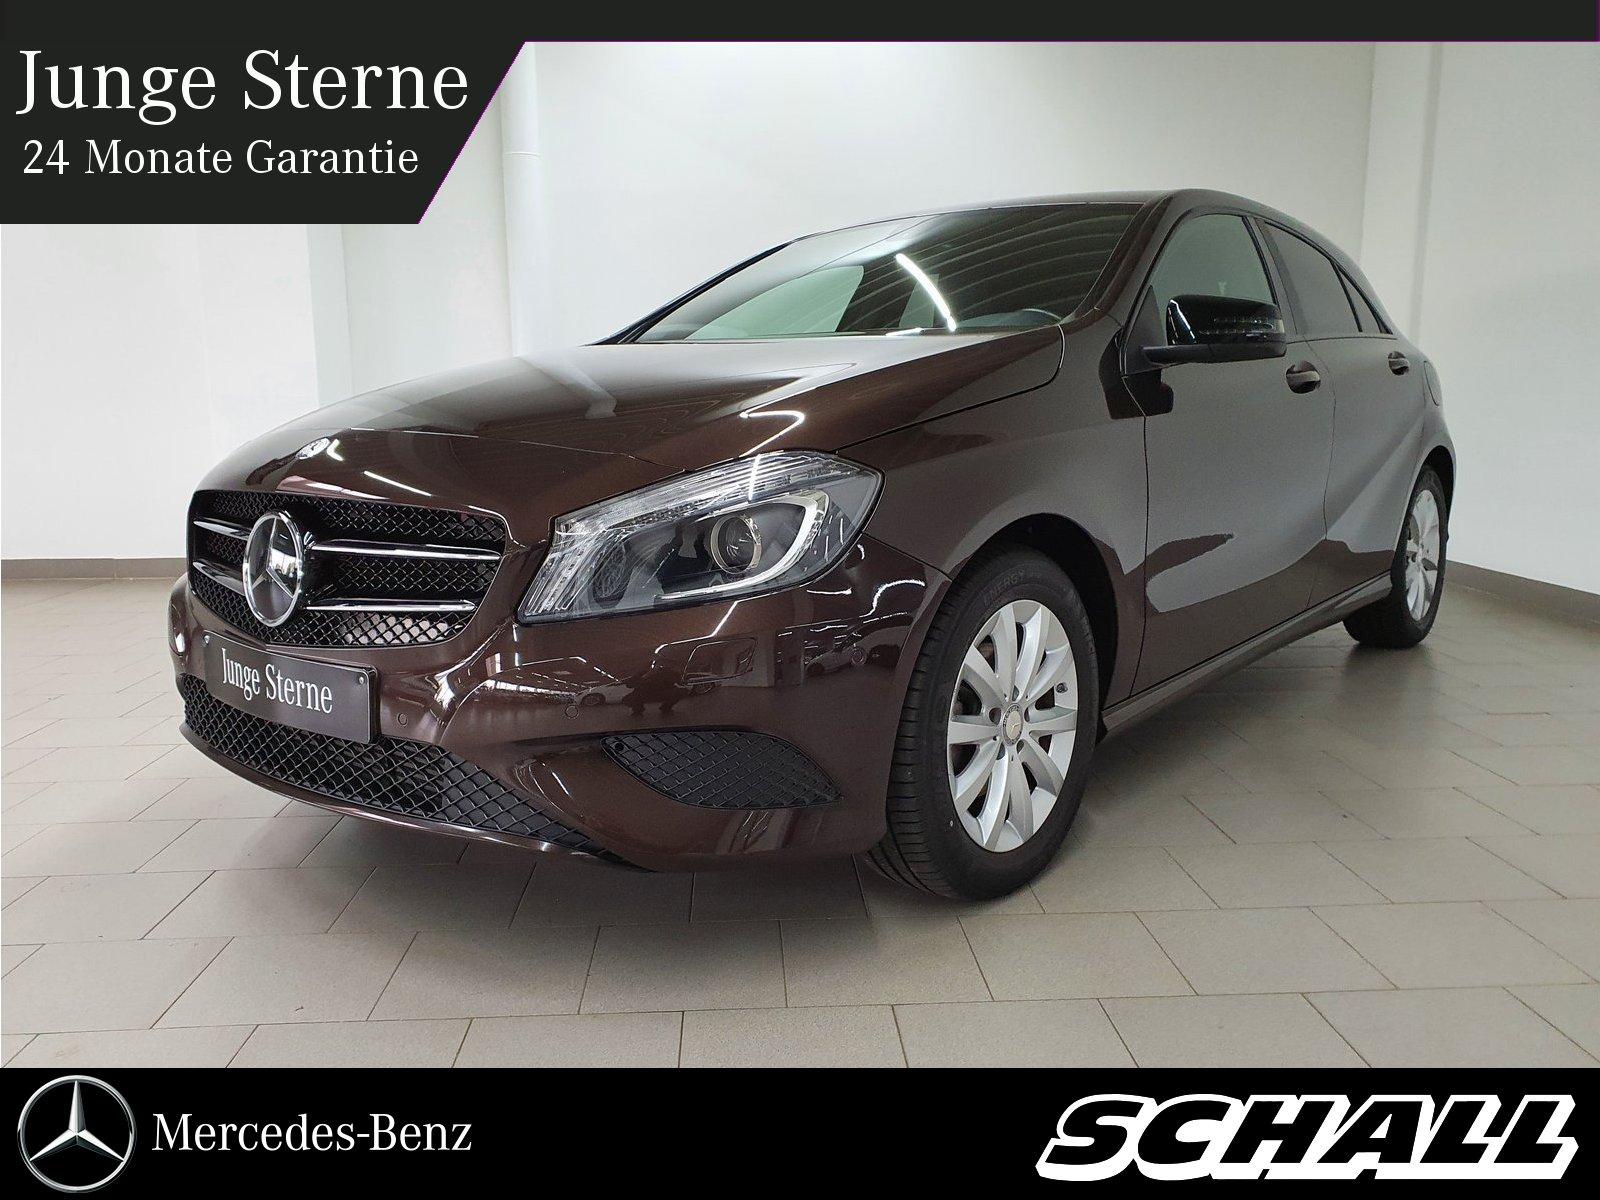 Mercedes-Benz A 180 CDI URBAN+BI-XENON+PARKTRONIC+SITZHEIZUNG, Jahr 2014, Diesel